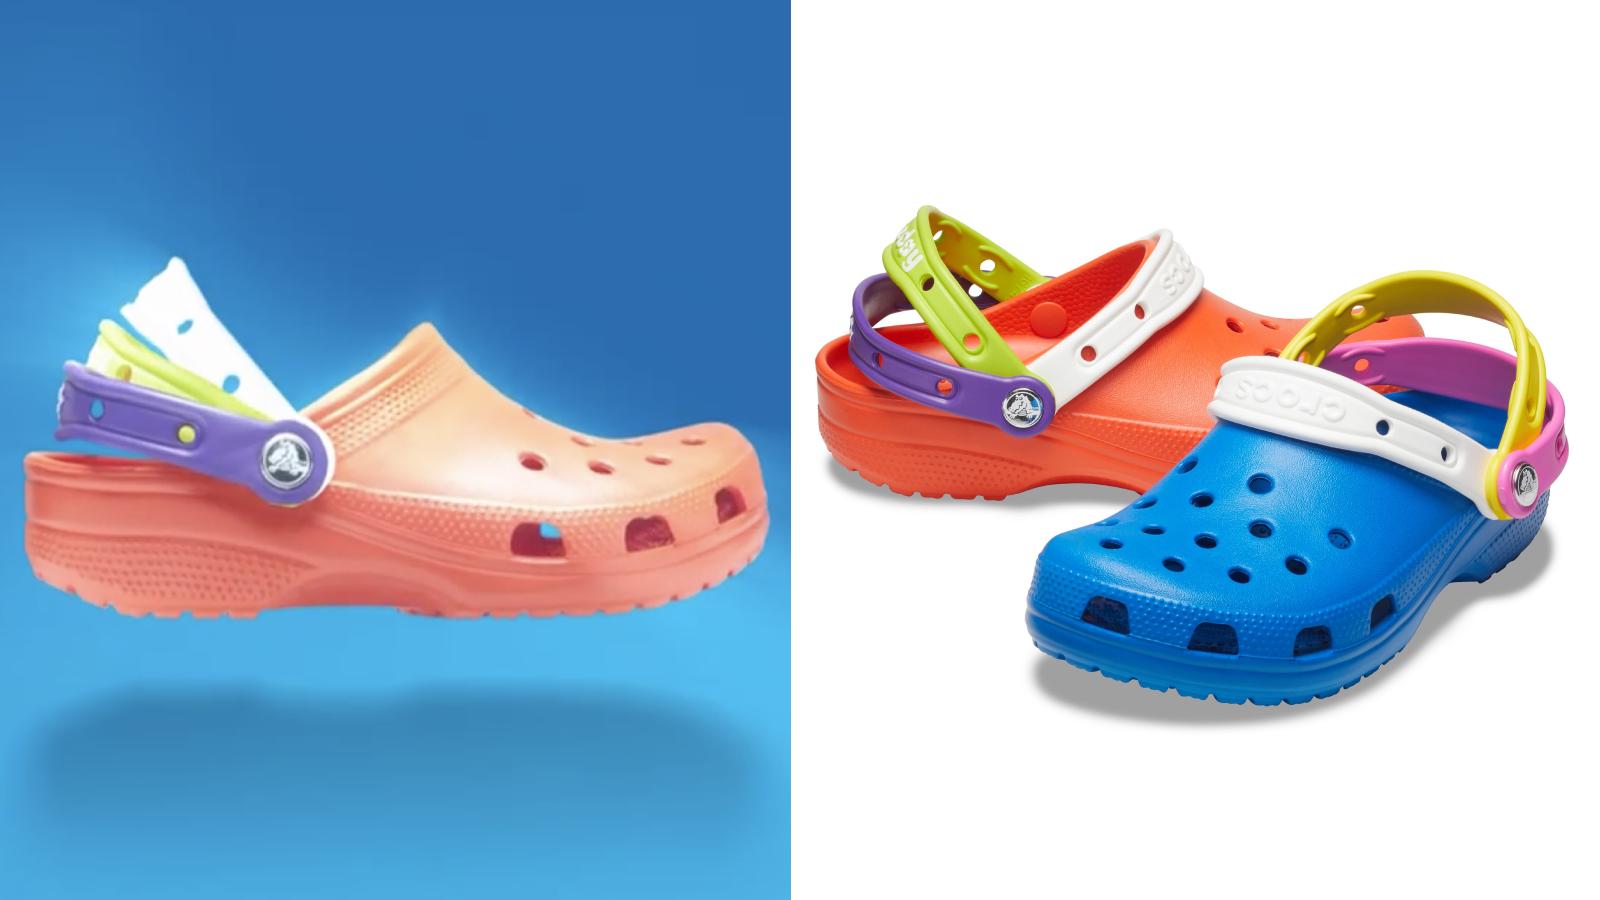 buy Croc Day 2020 Crocs classic clogs